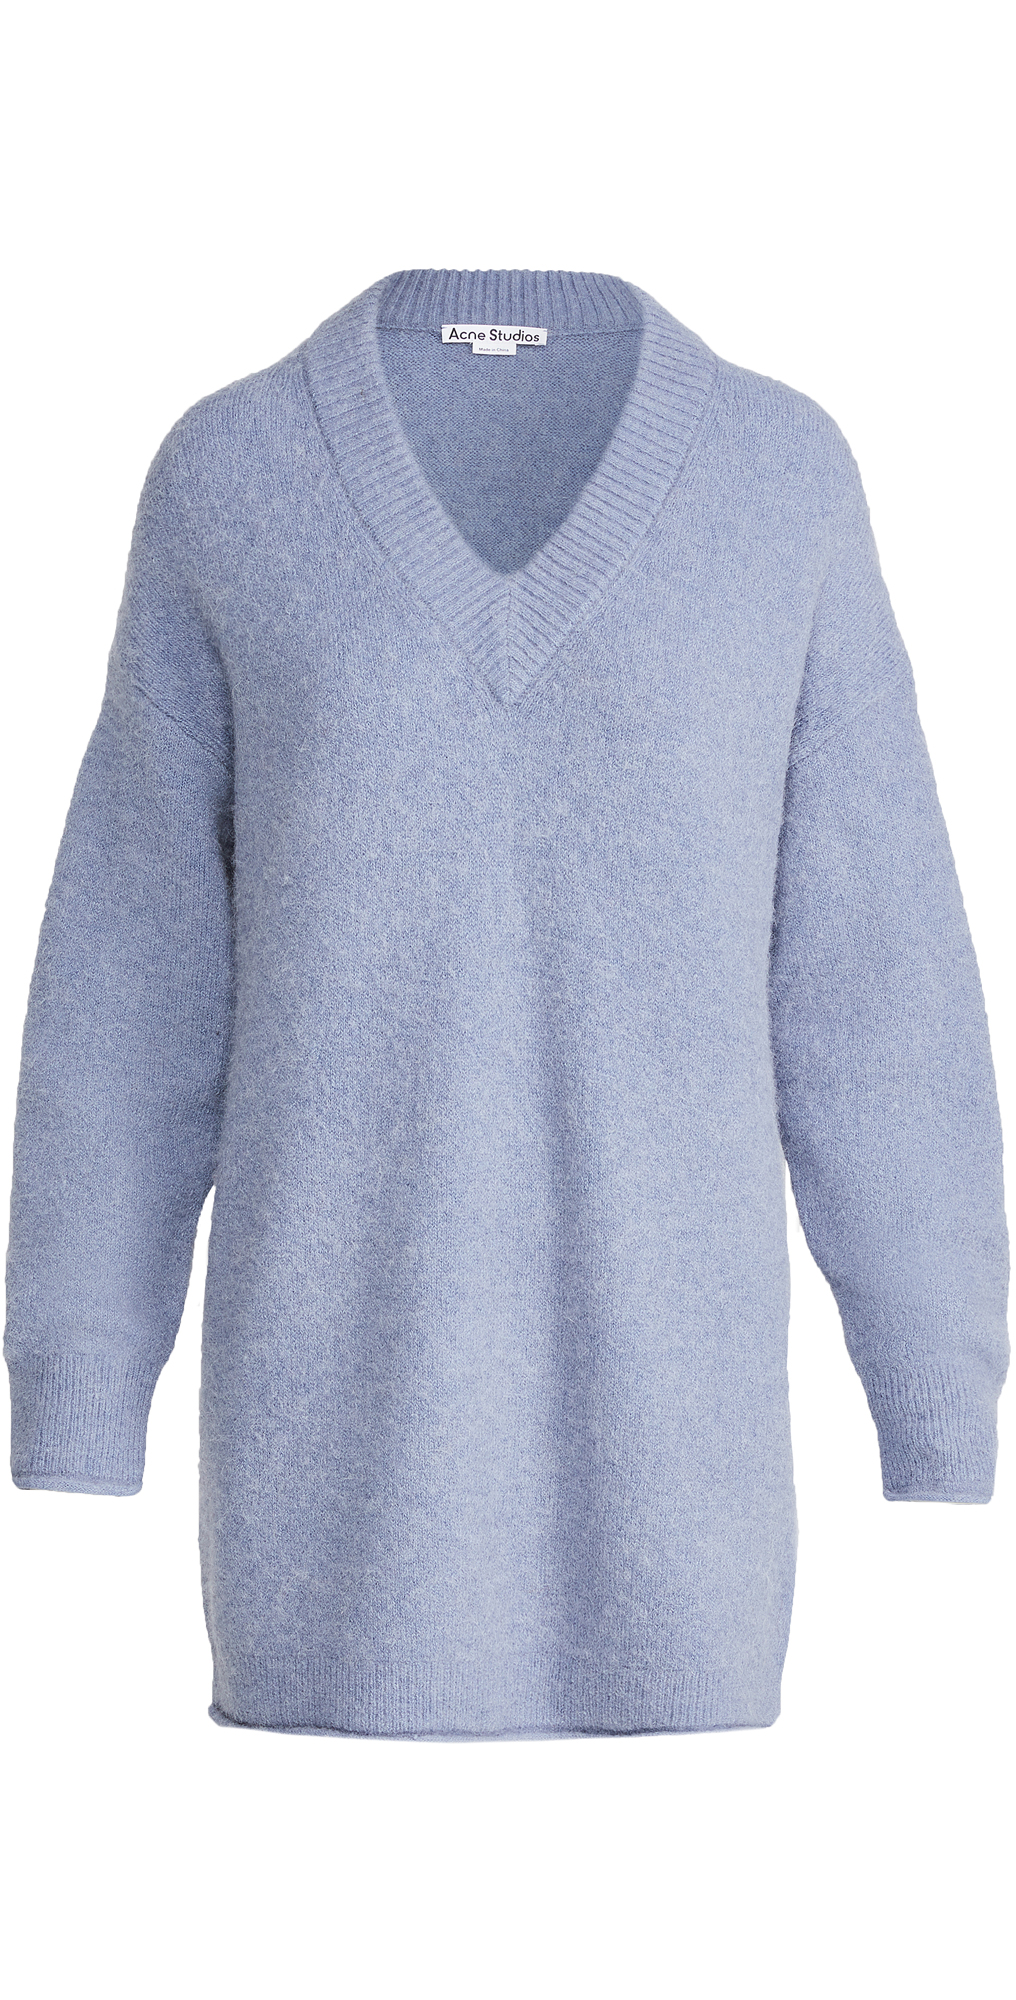 Acne Studios Keandra Fluffy Alpaca Sweater